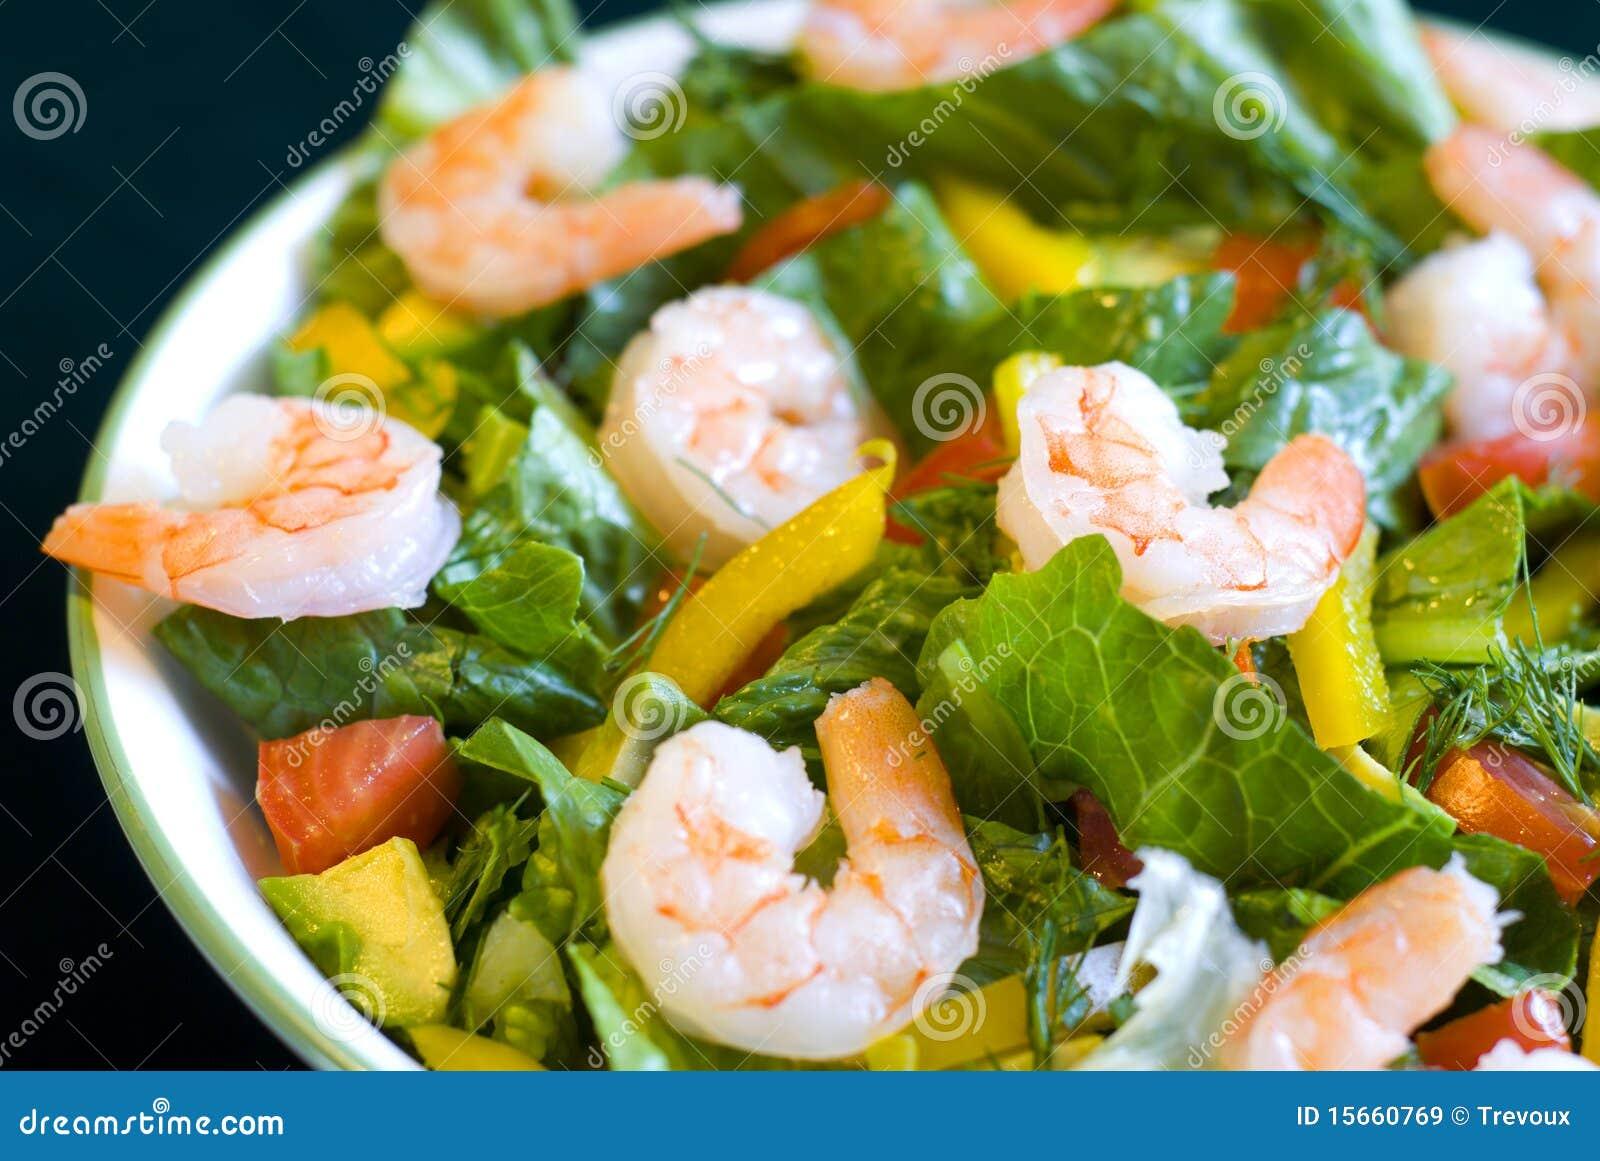 Fresh shrimp salad close-up.